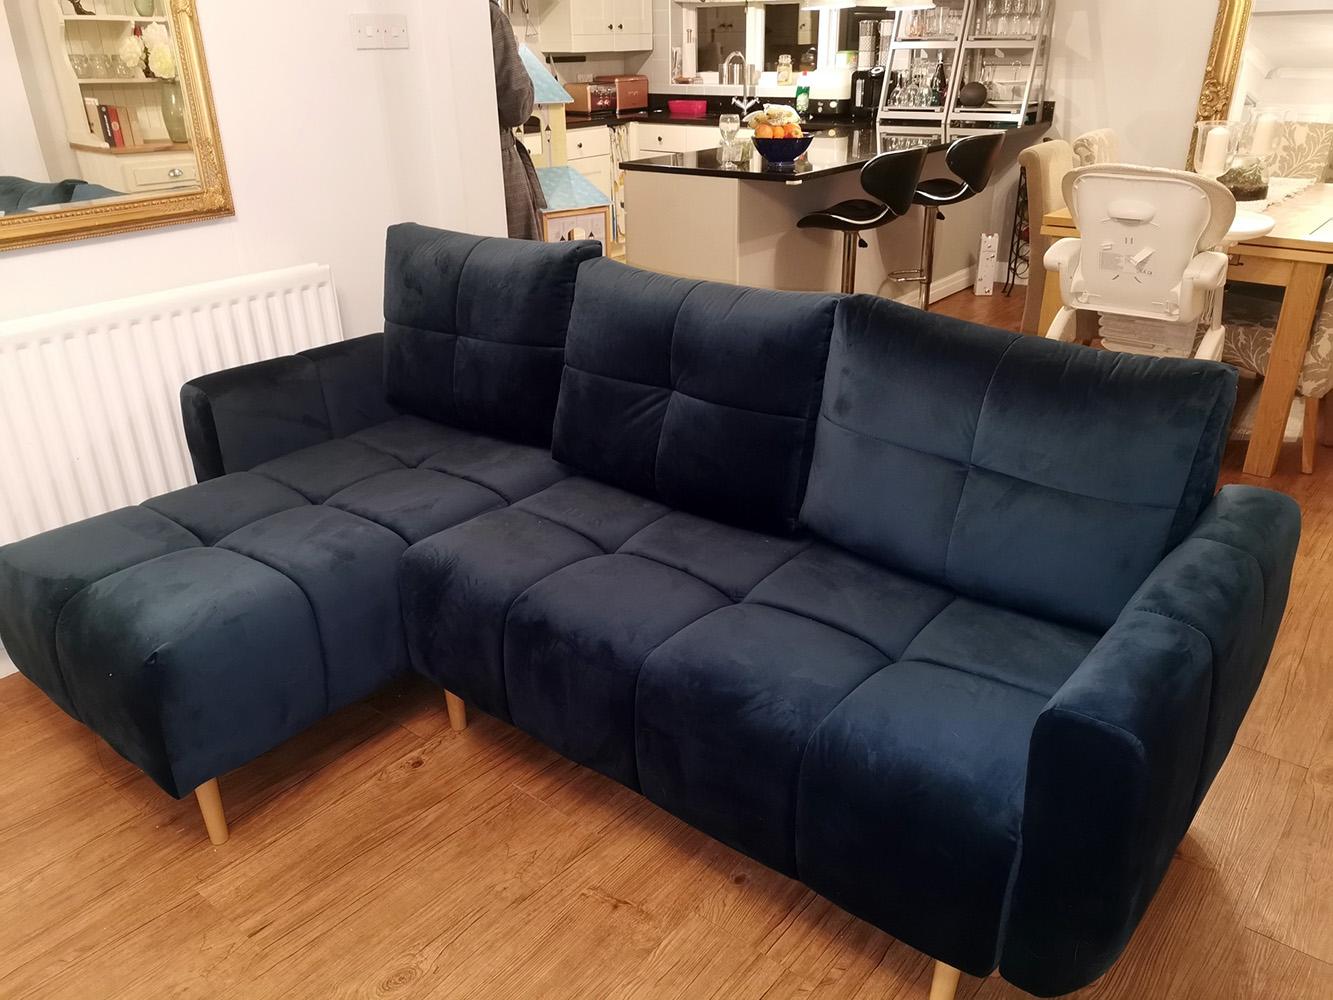 Navy blue Globe corner sofa from Laura